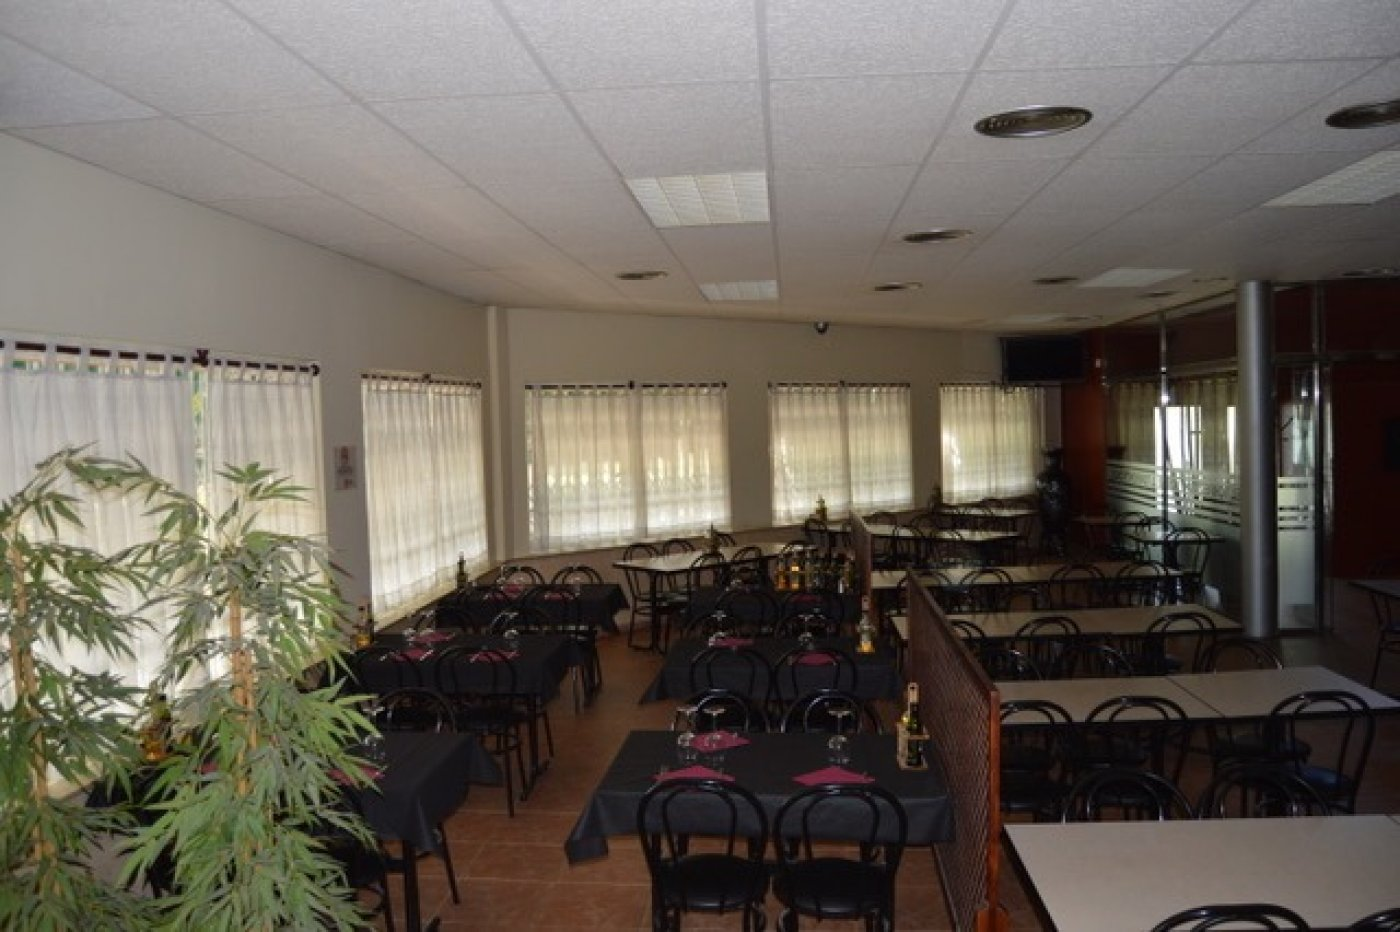 Nave restaurante en polígono cerca de sant sadurní d´anoia - imagenInmueble19